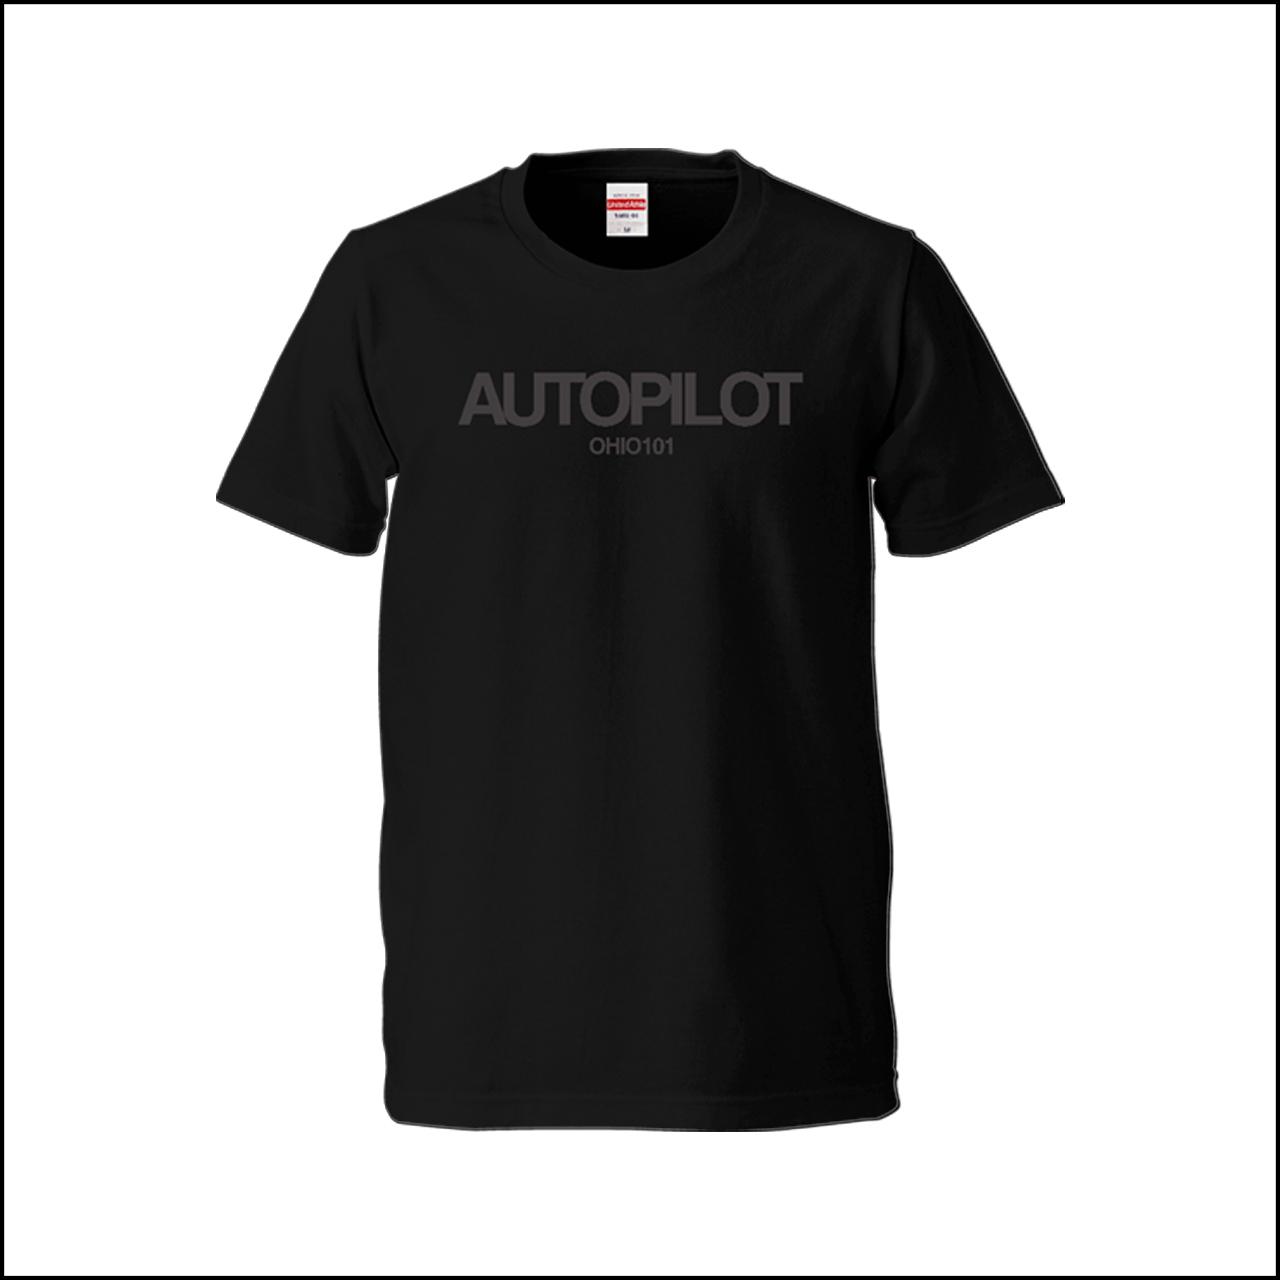 AUTOPILOT black × gray